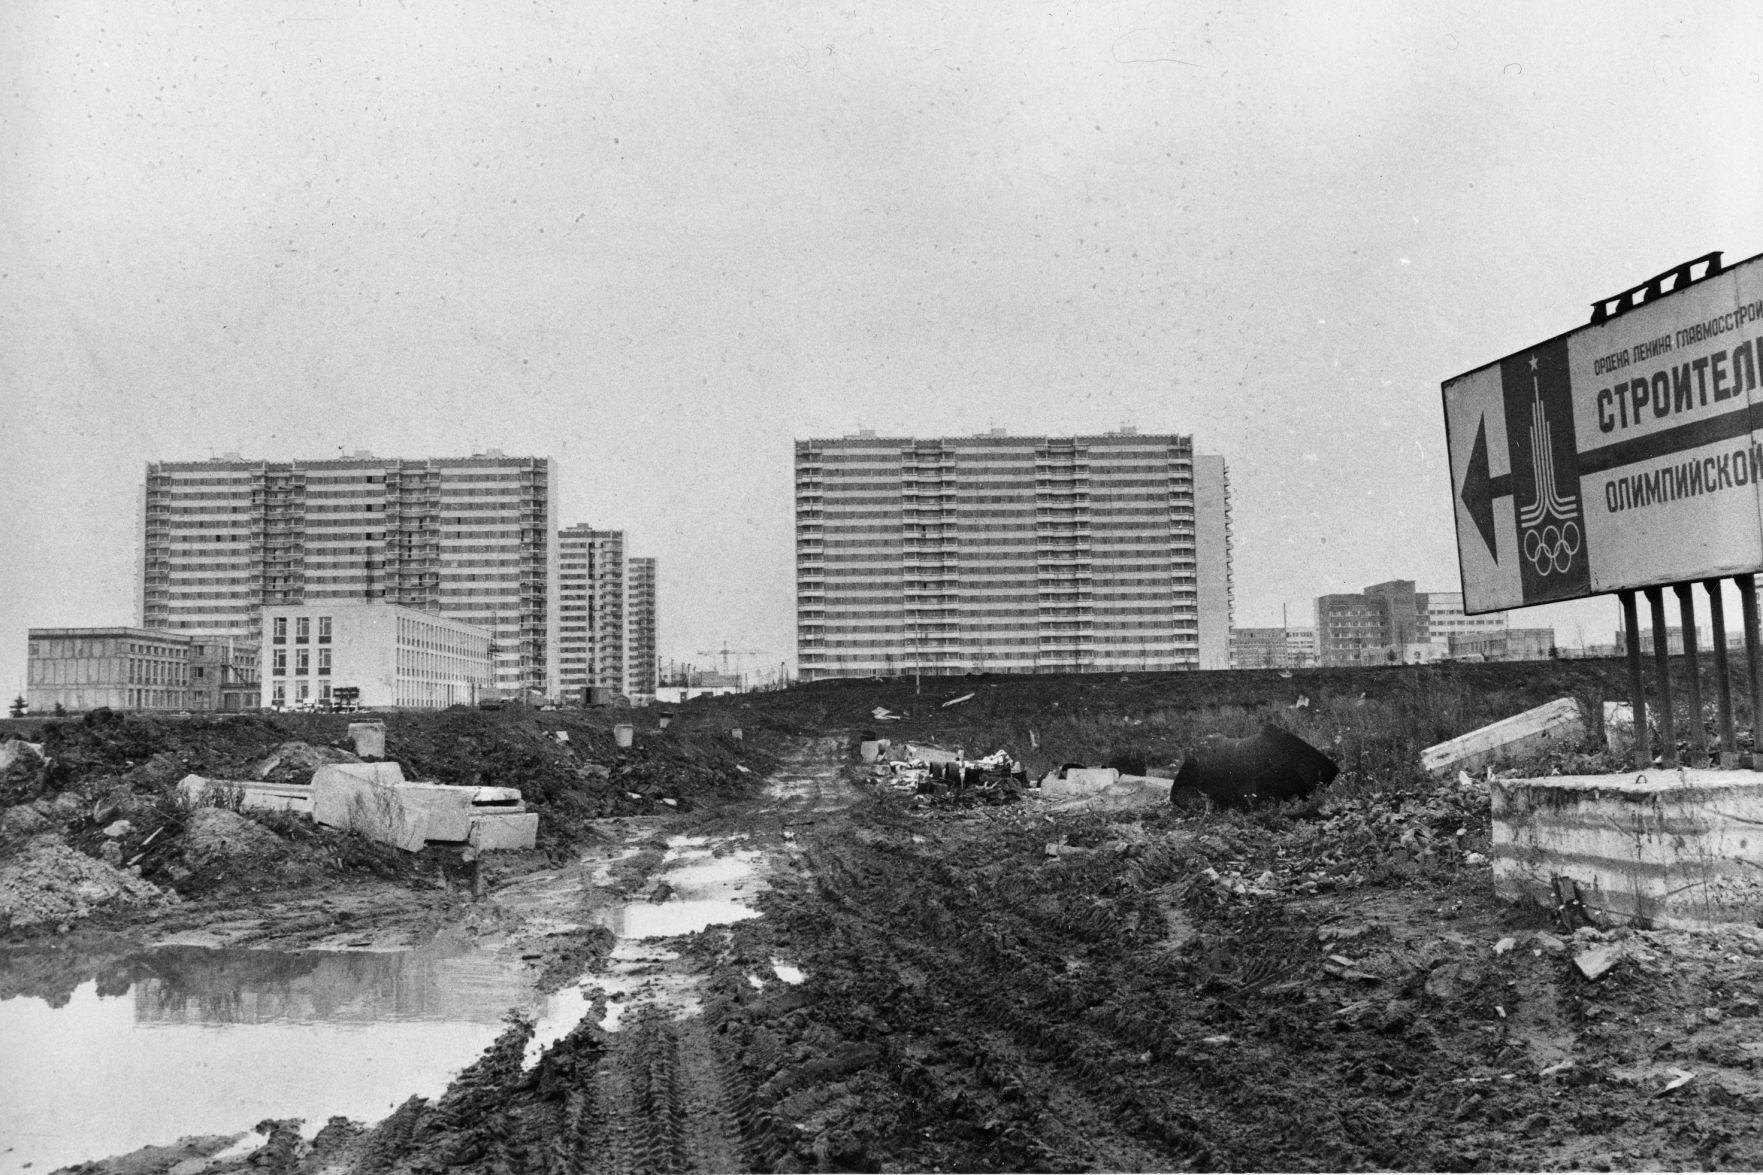 1978 Строительство Олимпийки Nov. 16, 1978. (AP Photo)